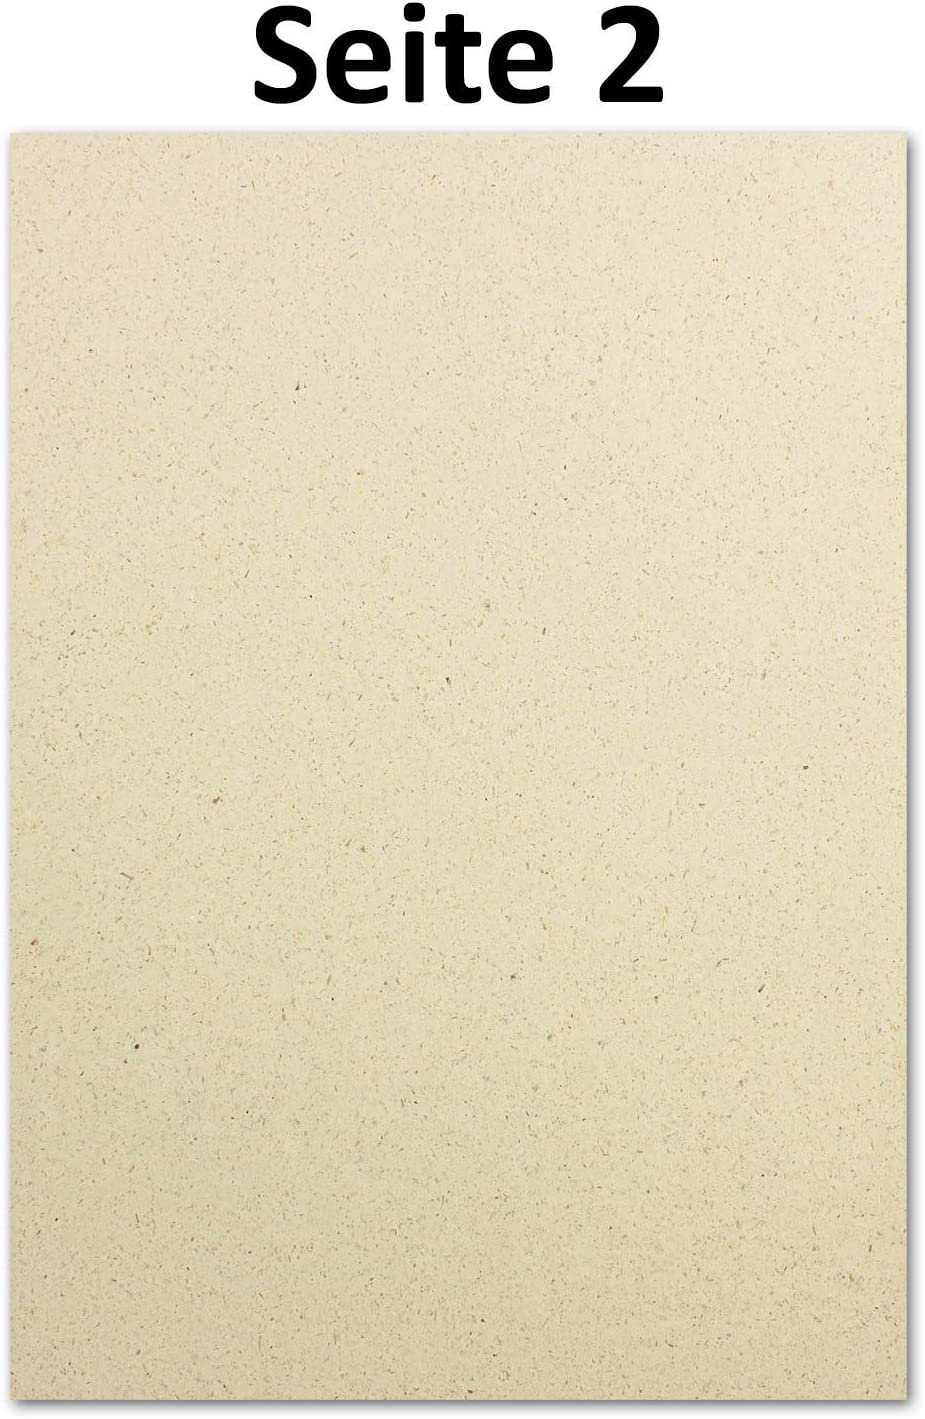 Gl/üxx Agent Umwelt Bastelpapier f/ür Einladungen oder Men/ükarte Braunes Recycling Papier 100 g//m/² 500x /ÖKO Briefpapier aus Graspapier DIN A4